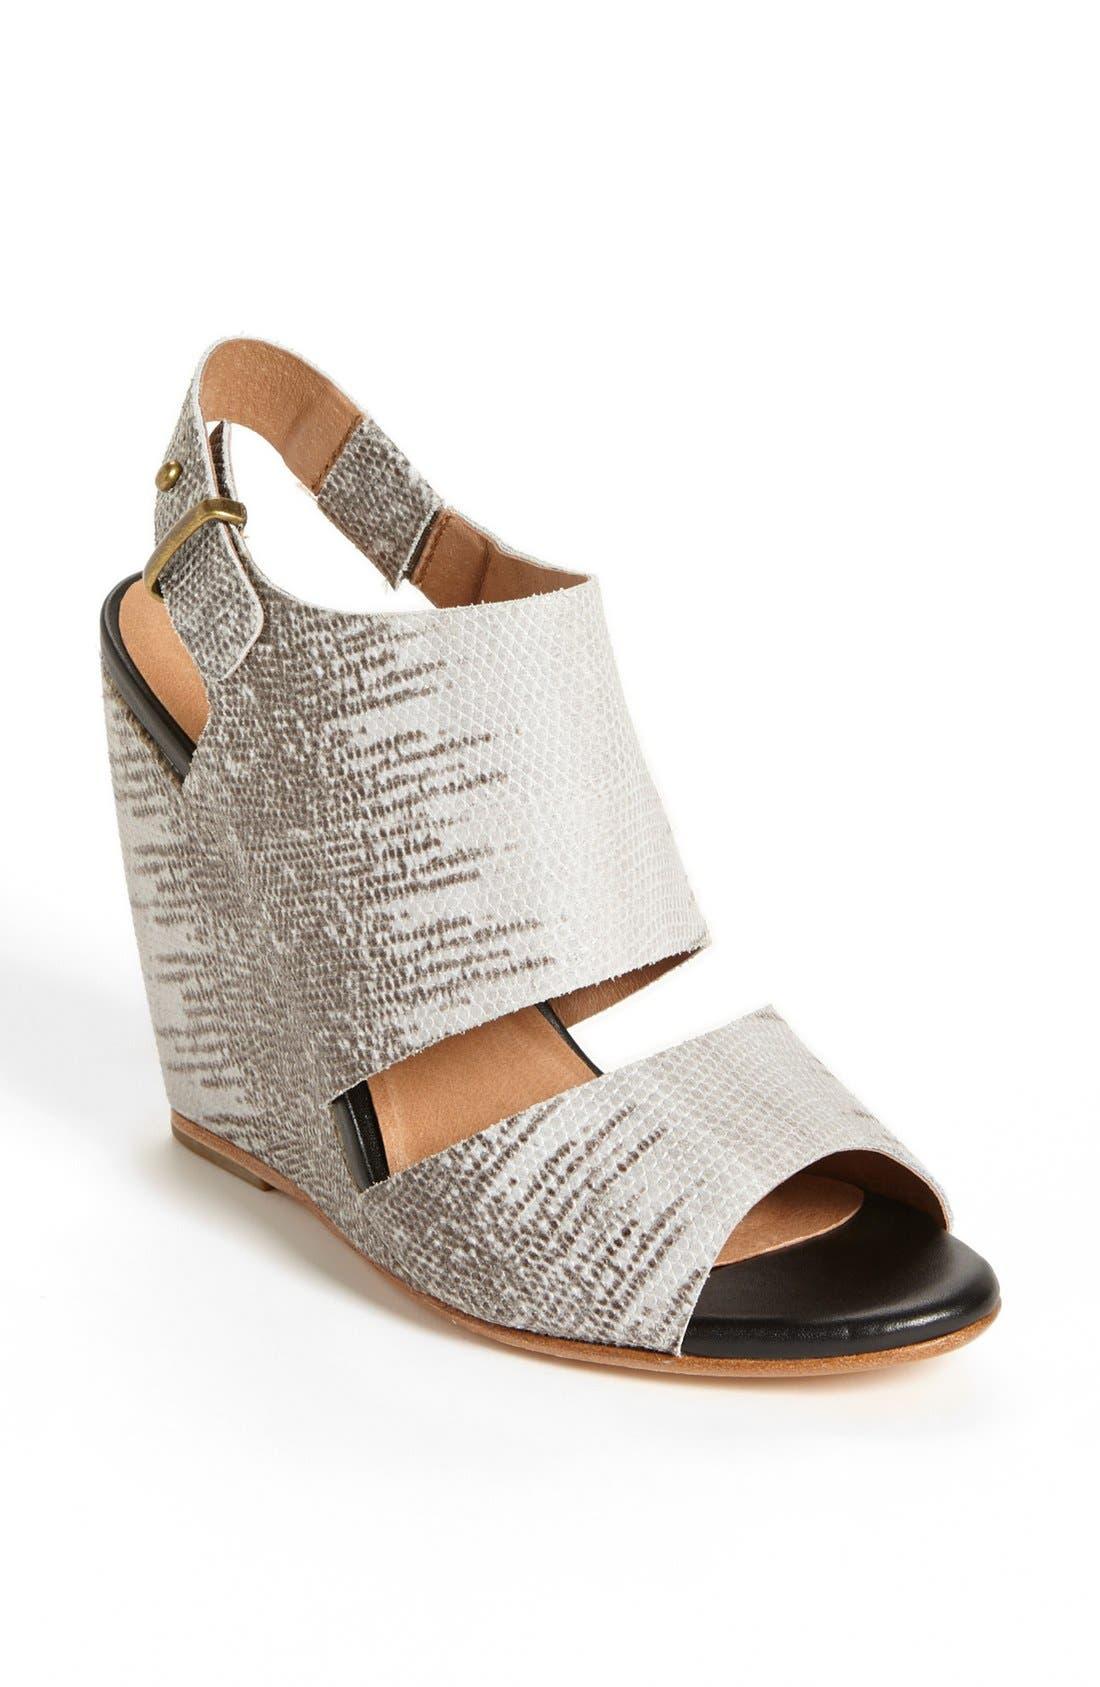 Alternate Image 1 Selected - Joie 'Ashland' Wedge Sandal